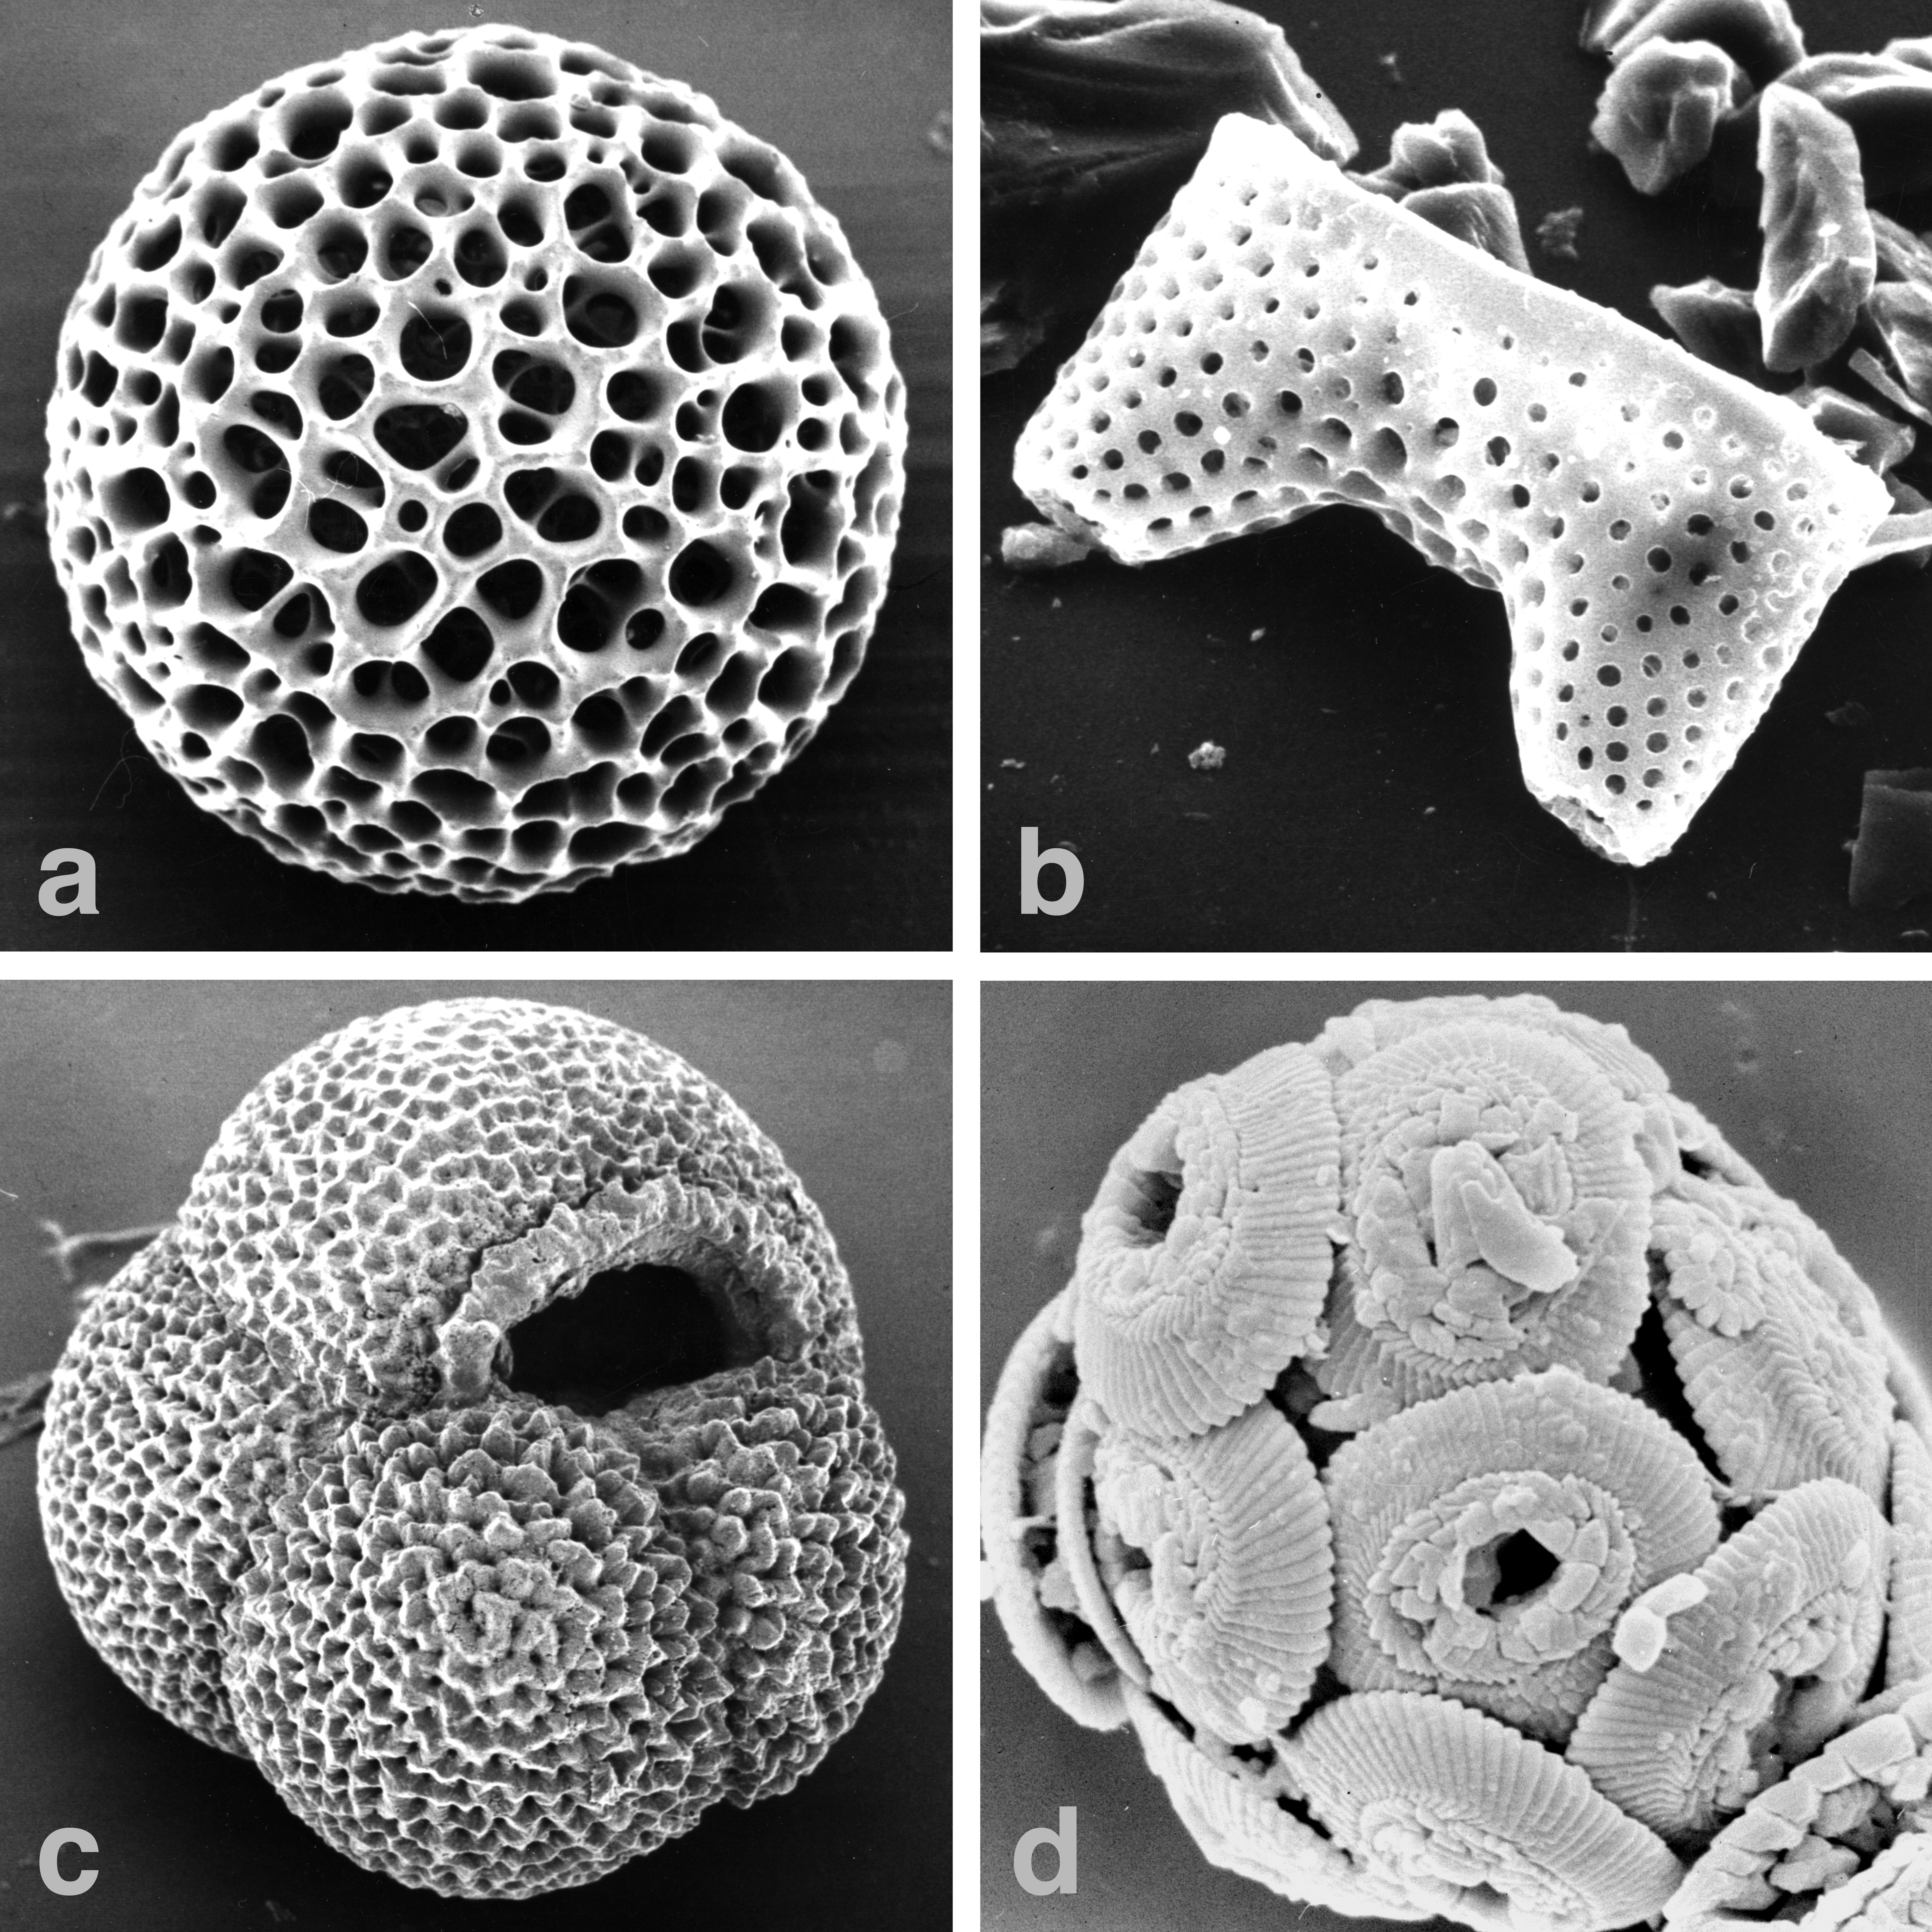 File:Marine-microfossils-major hg.jpg - Wikimedia Commons